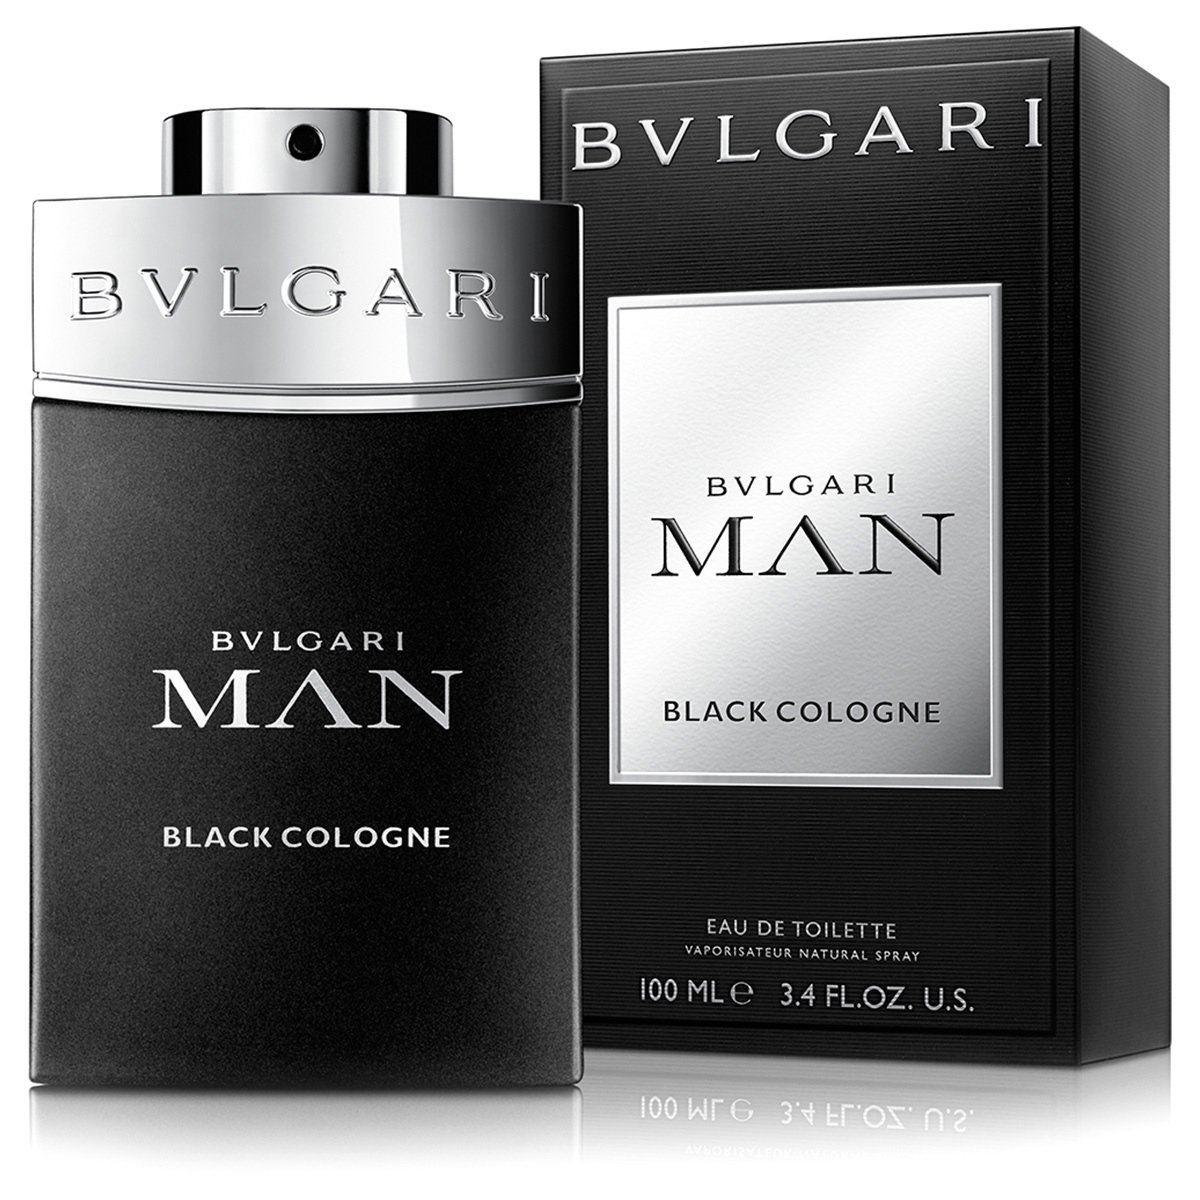 51b8ffd0b6d Perfume Man Black Cologne Bvlgari Masculino Eau De Toilette 100ml ...